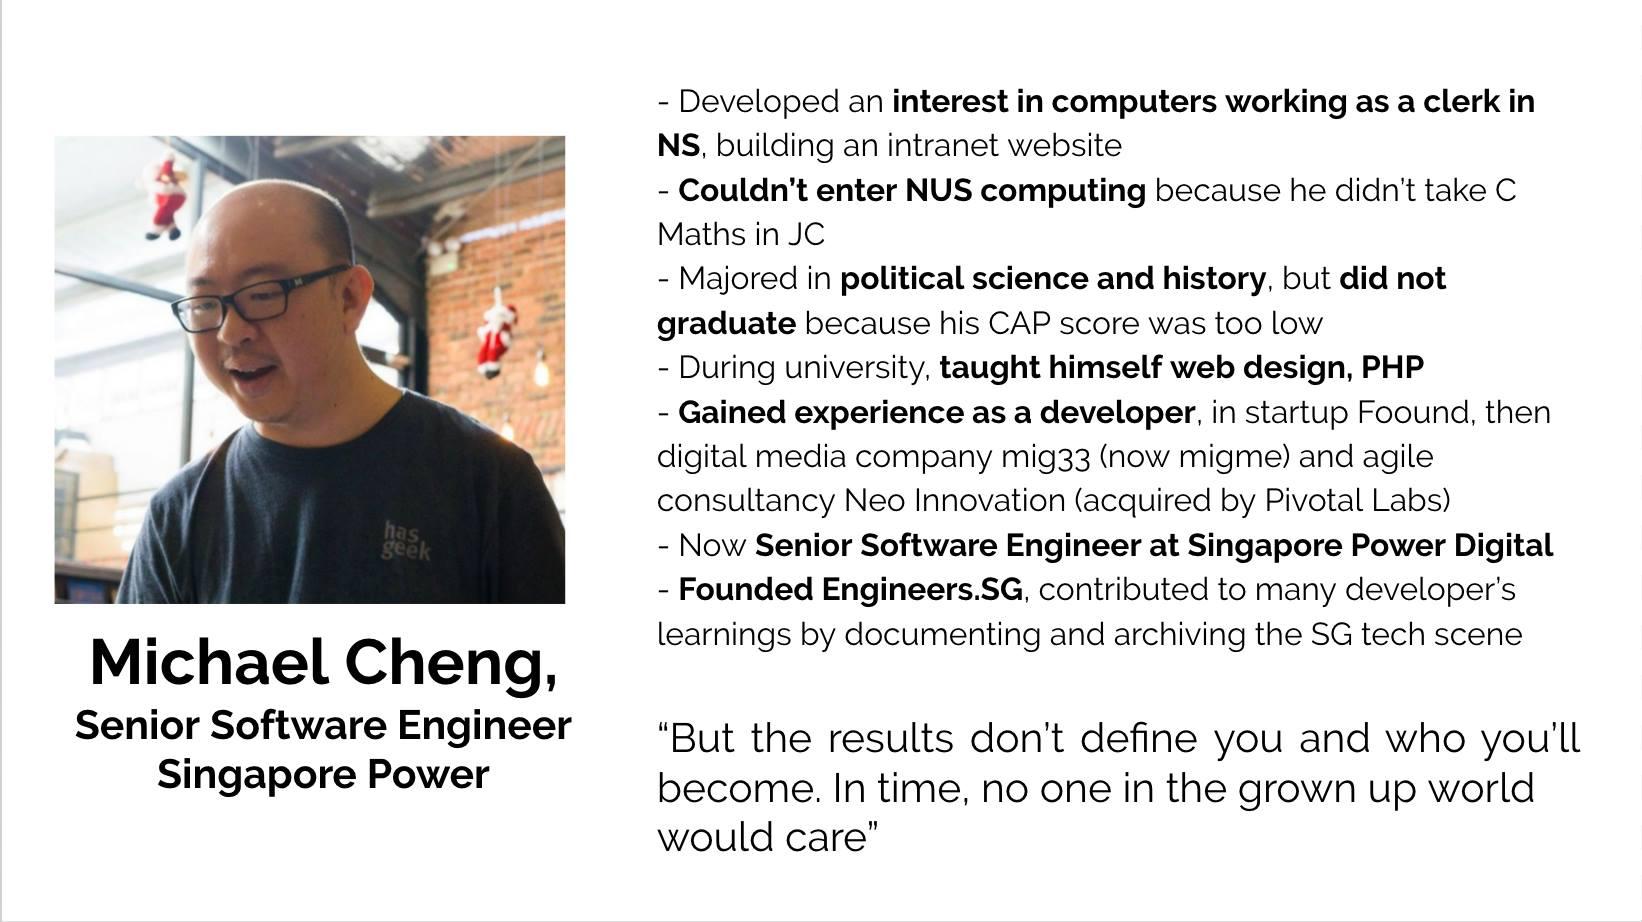 Michael Cheng, Senior Software Engineer, Singapore Power